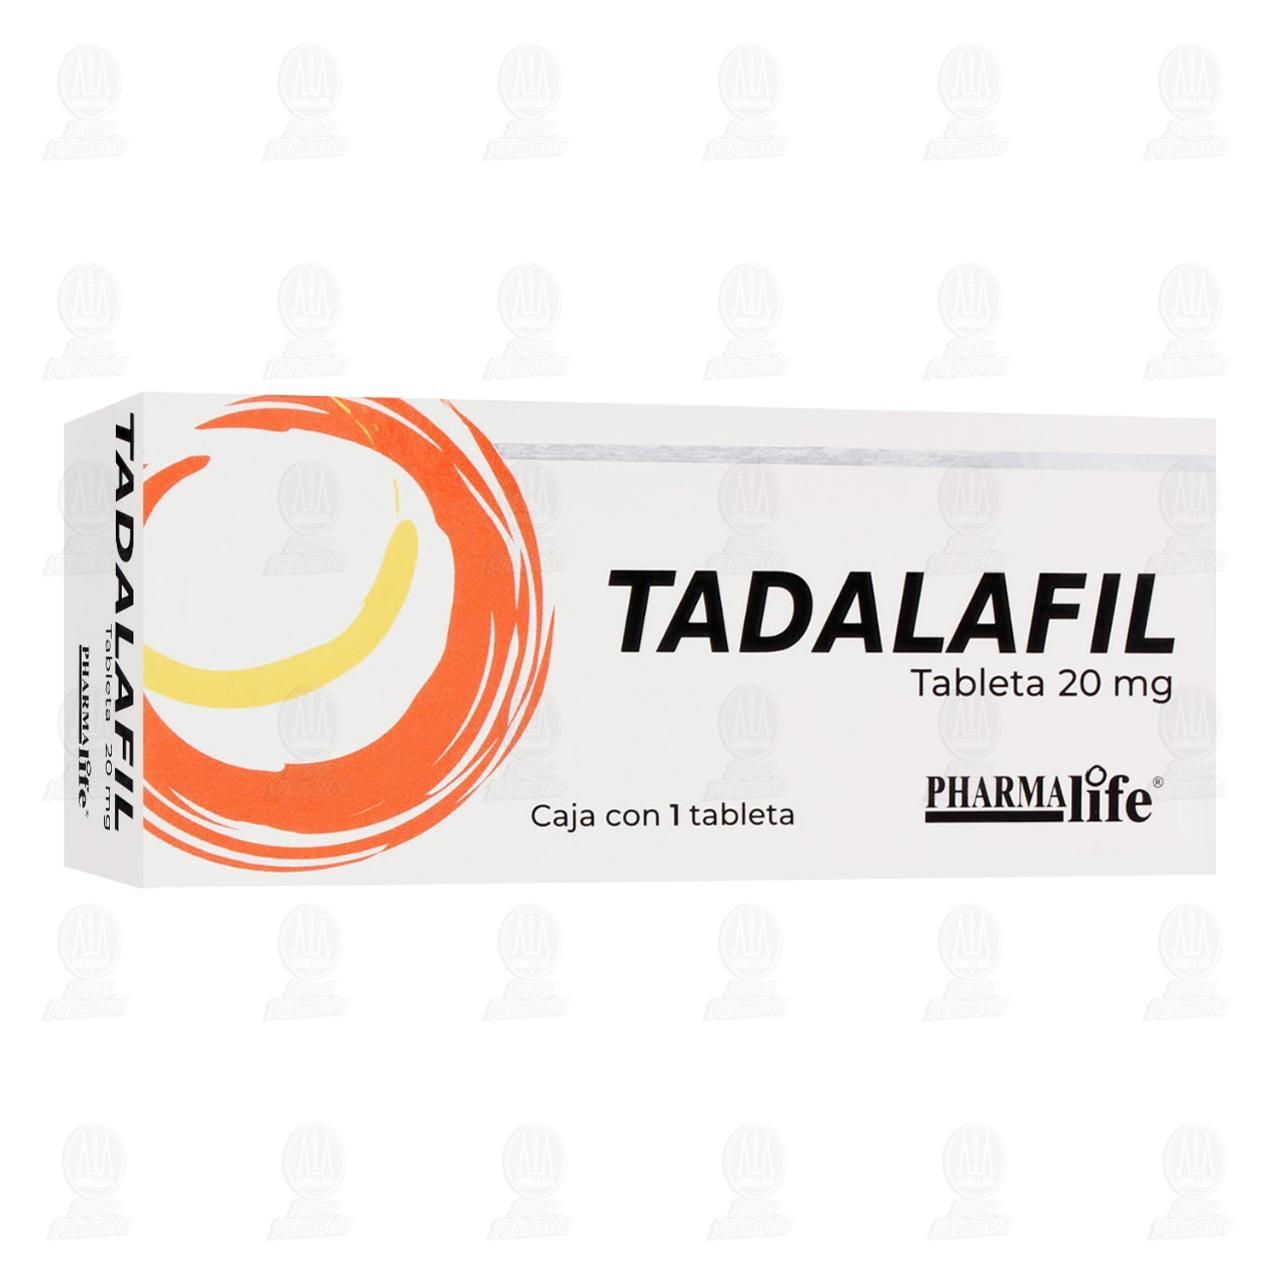 Comprar Tadalafil 20mg 1 Tableta Pharmalife en Farmacias Guadalajara